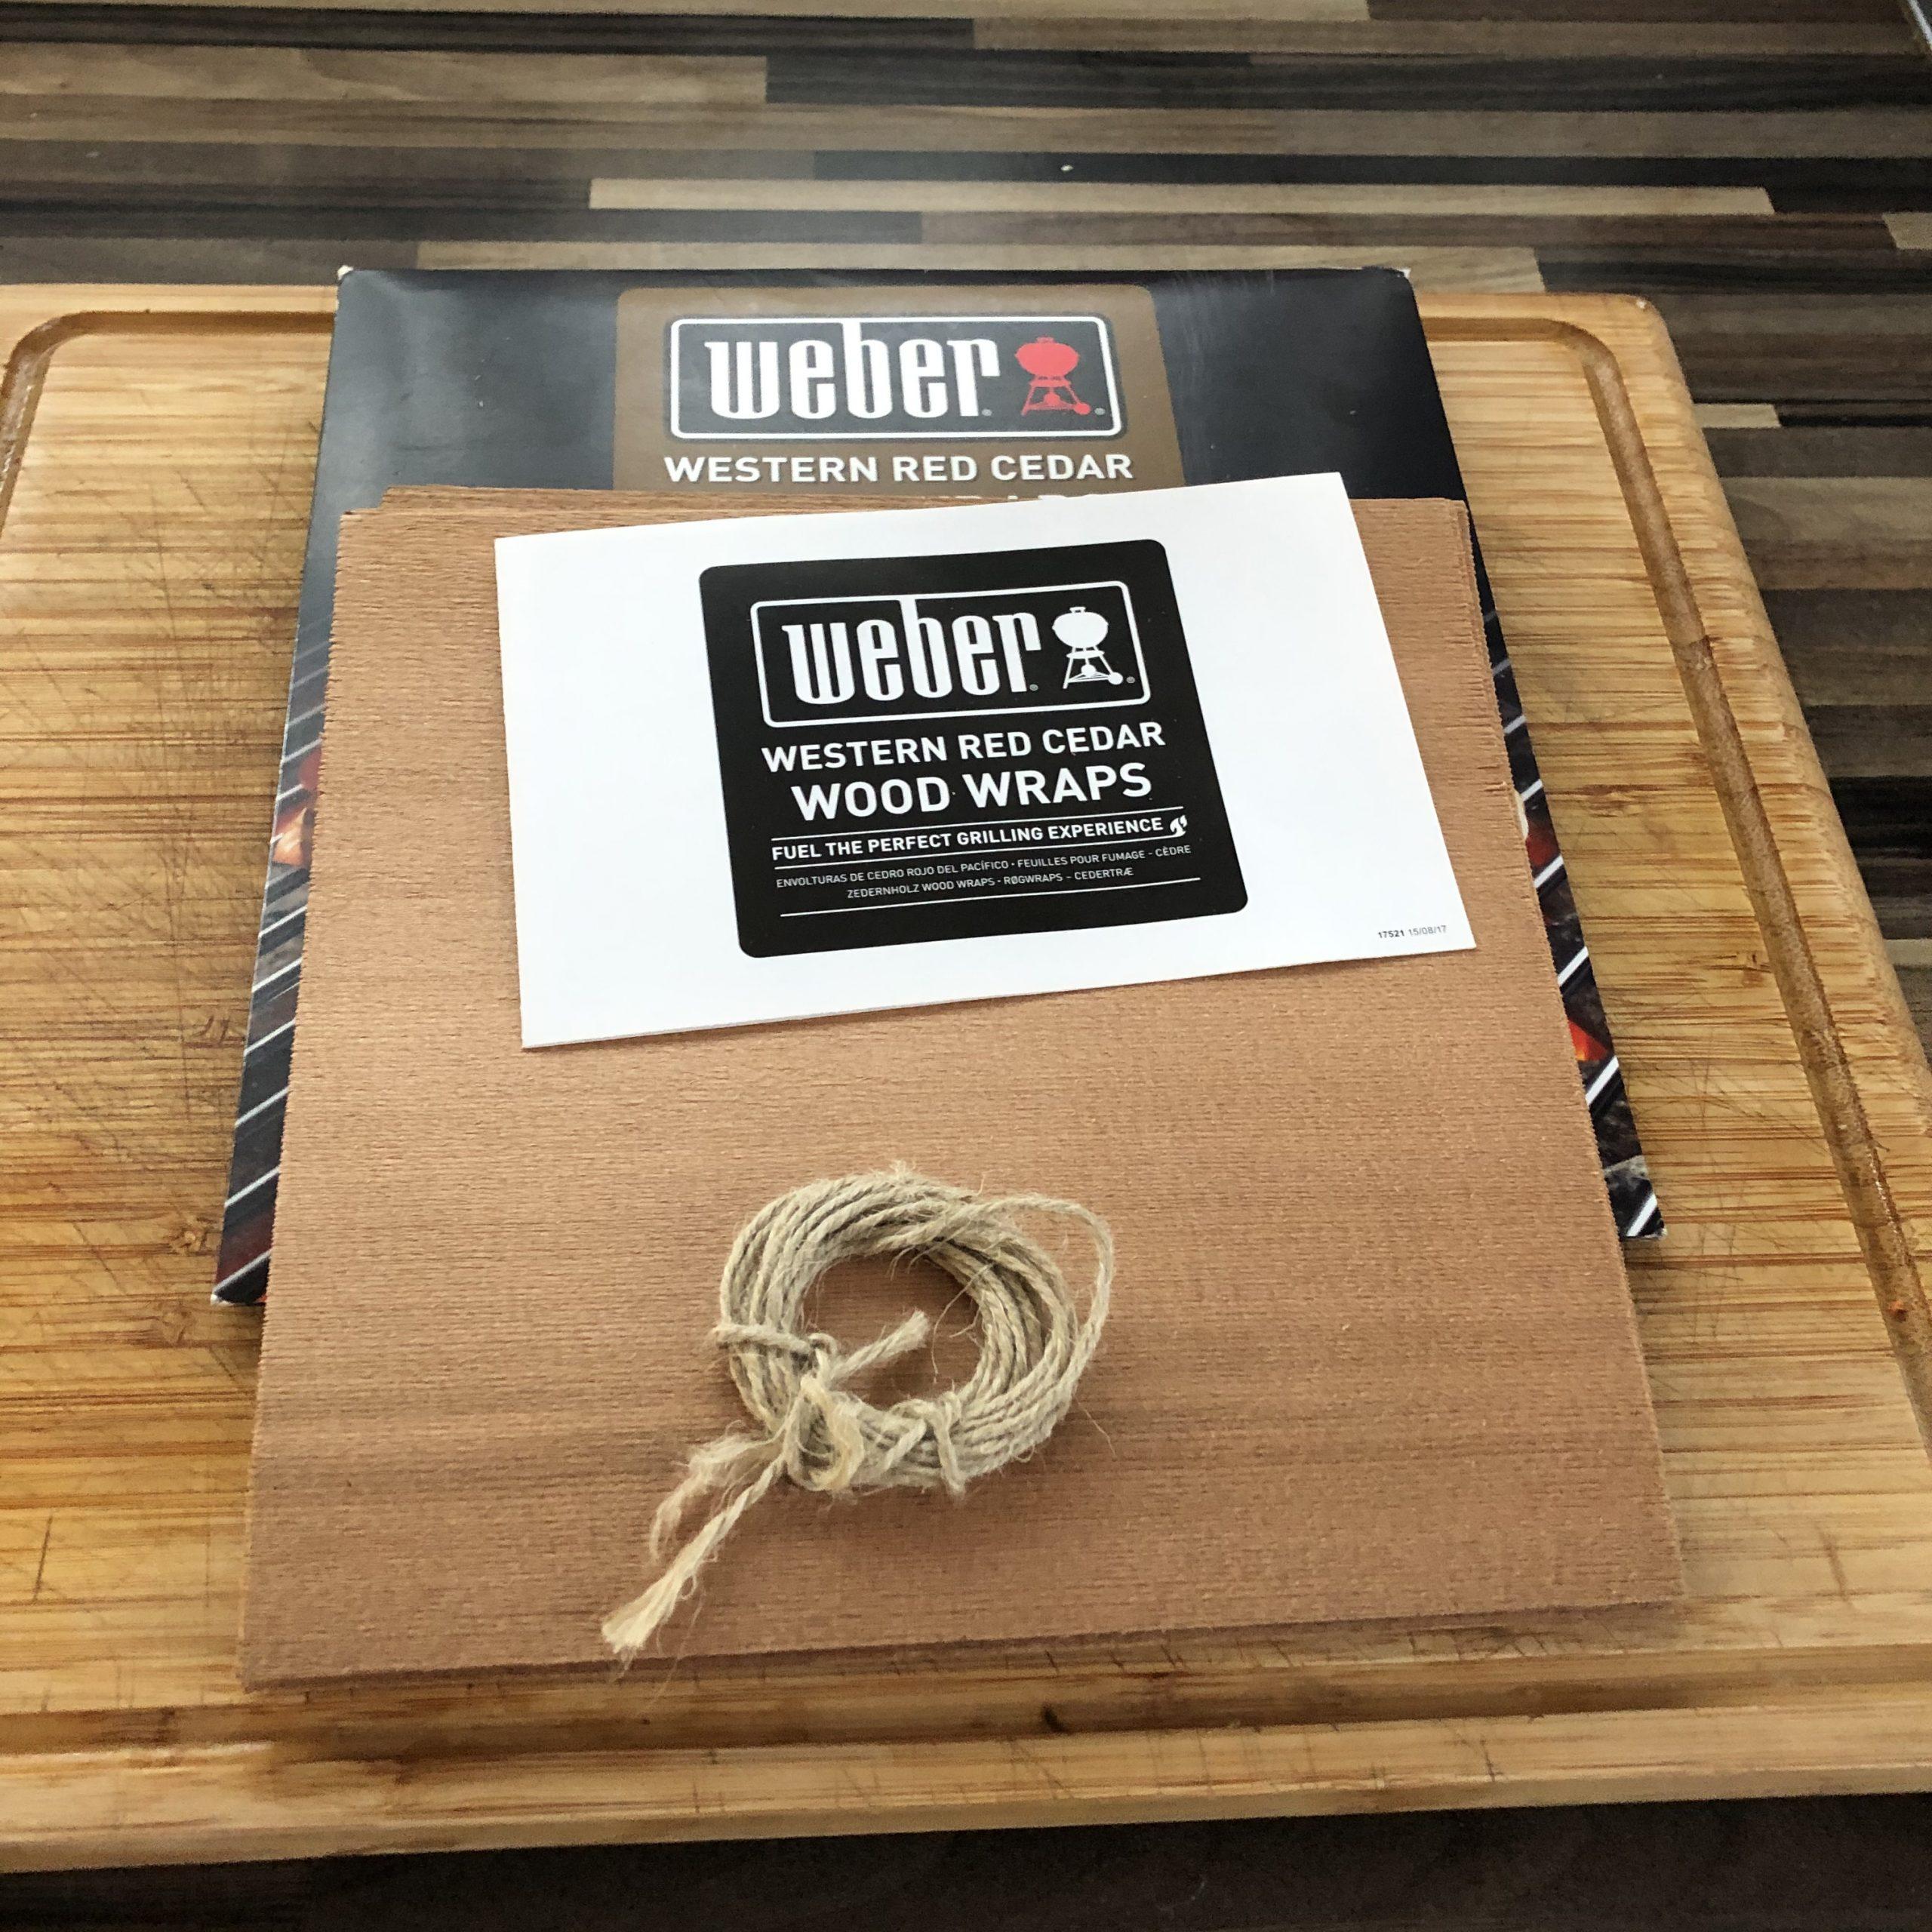 Weber Western Red Cedar Wood Wraps